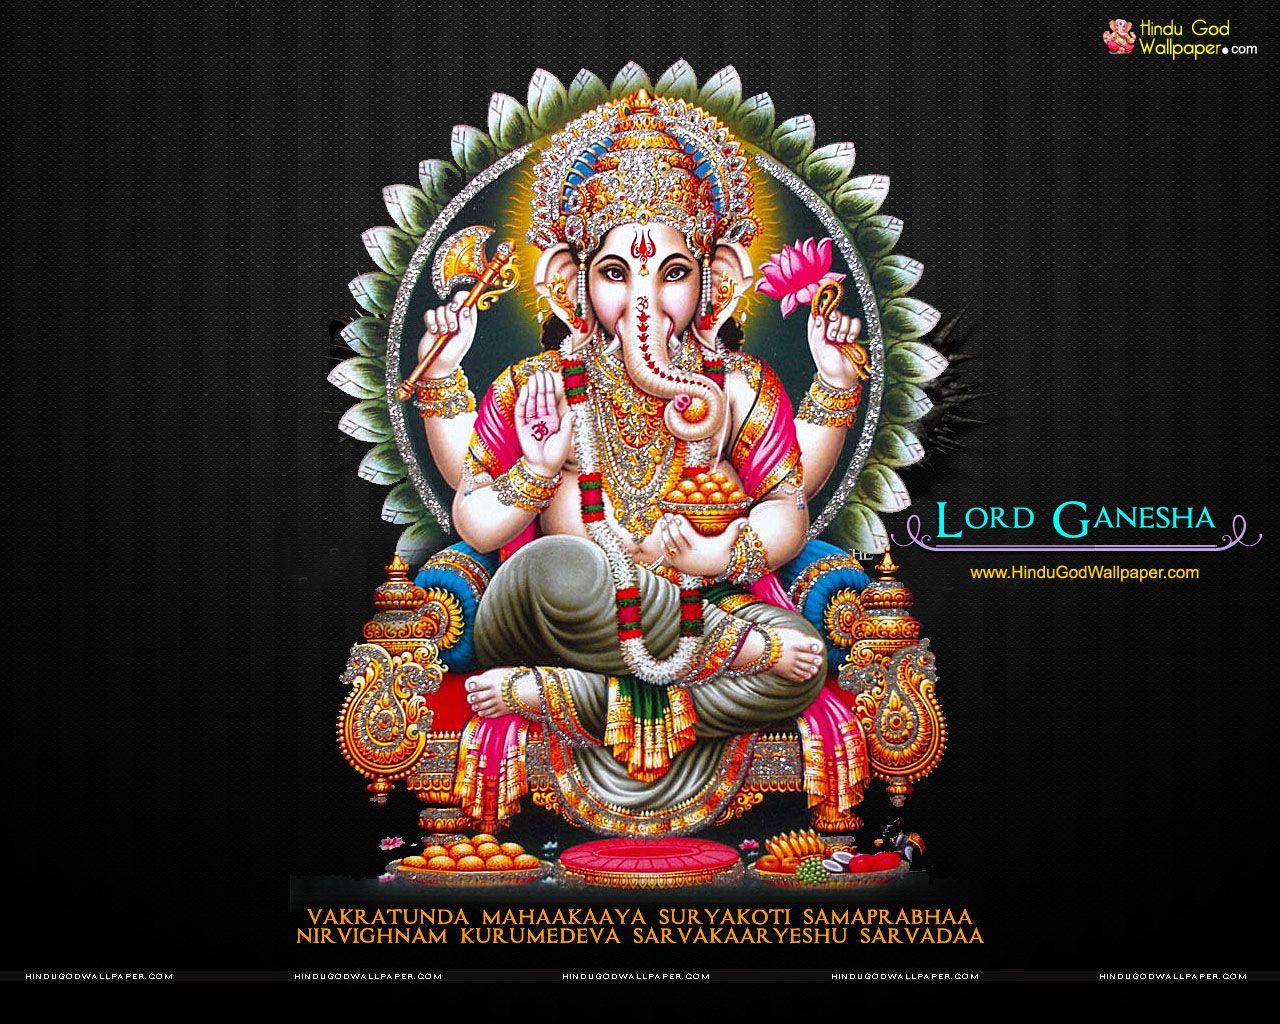 Download Images Of Lord Ganesha: Ganesh Wallpaper For Desktop HD Free Download